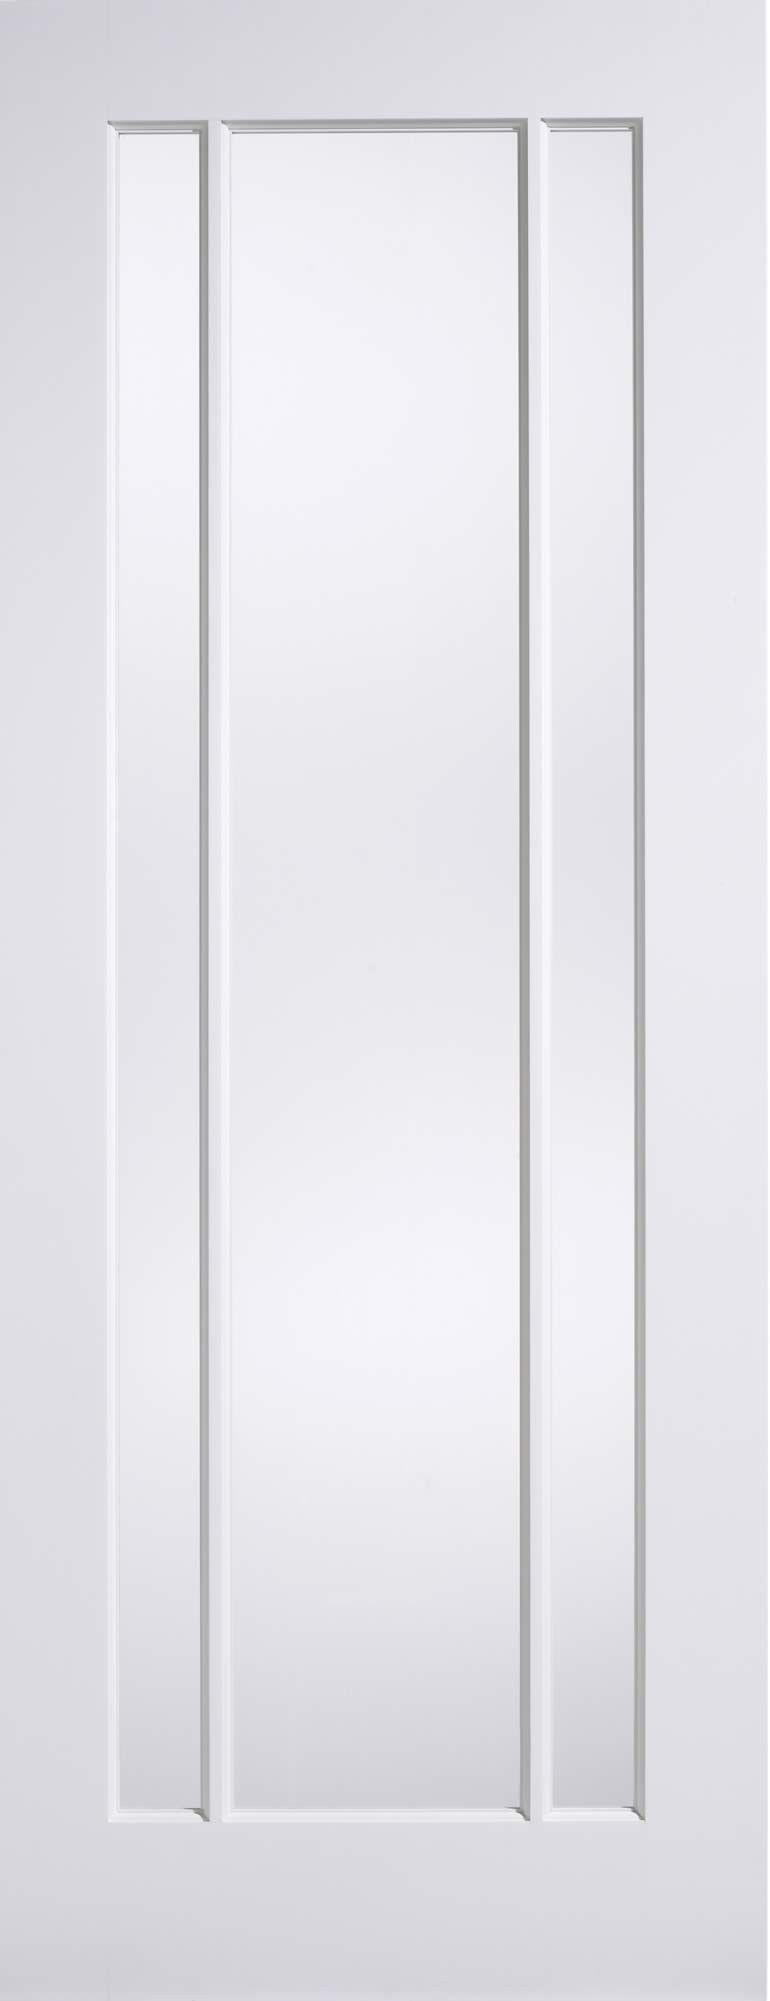 Worcester White Primed Clear Glazed 3 Panel Internal Door   Kaybee Doors